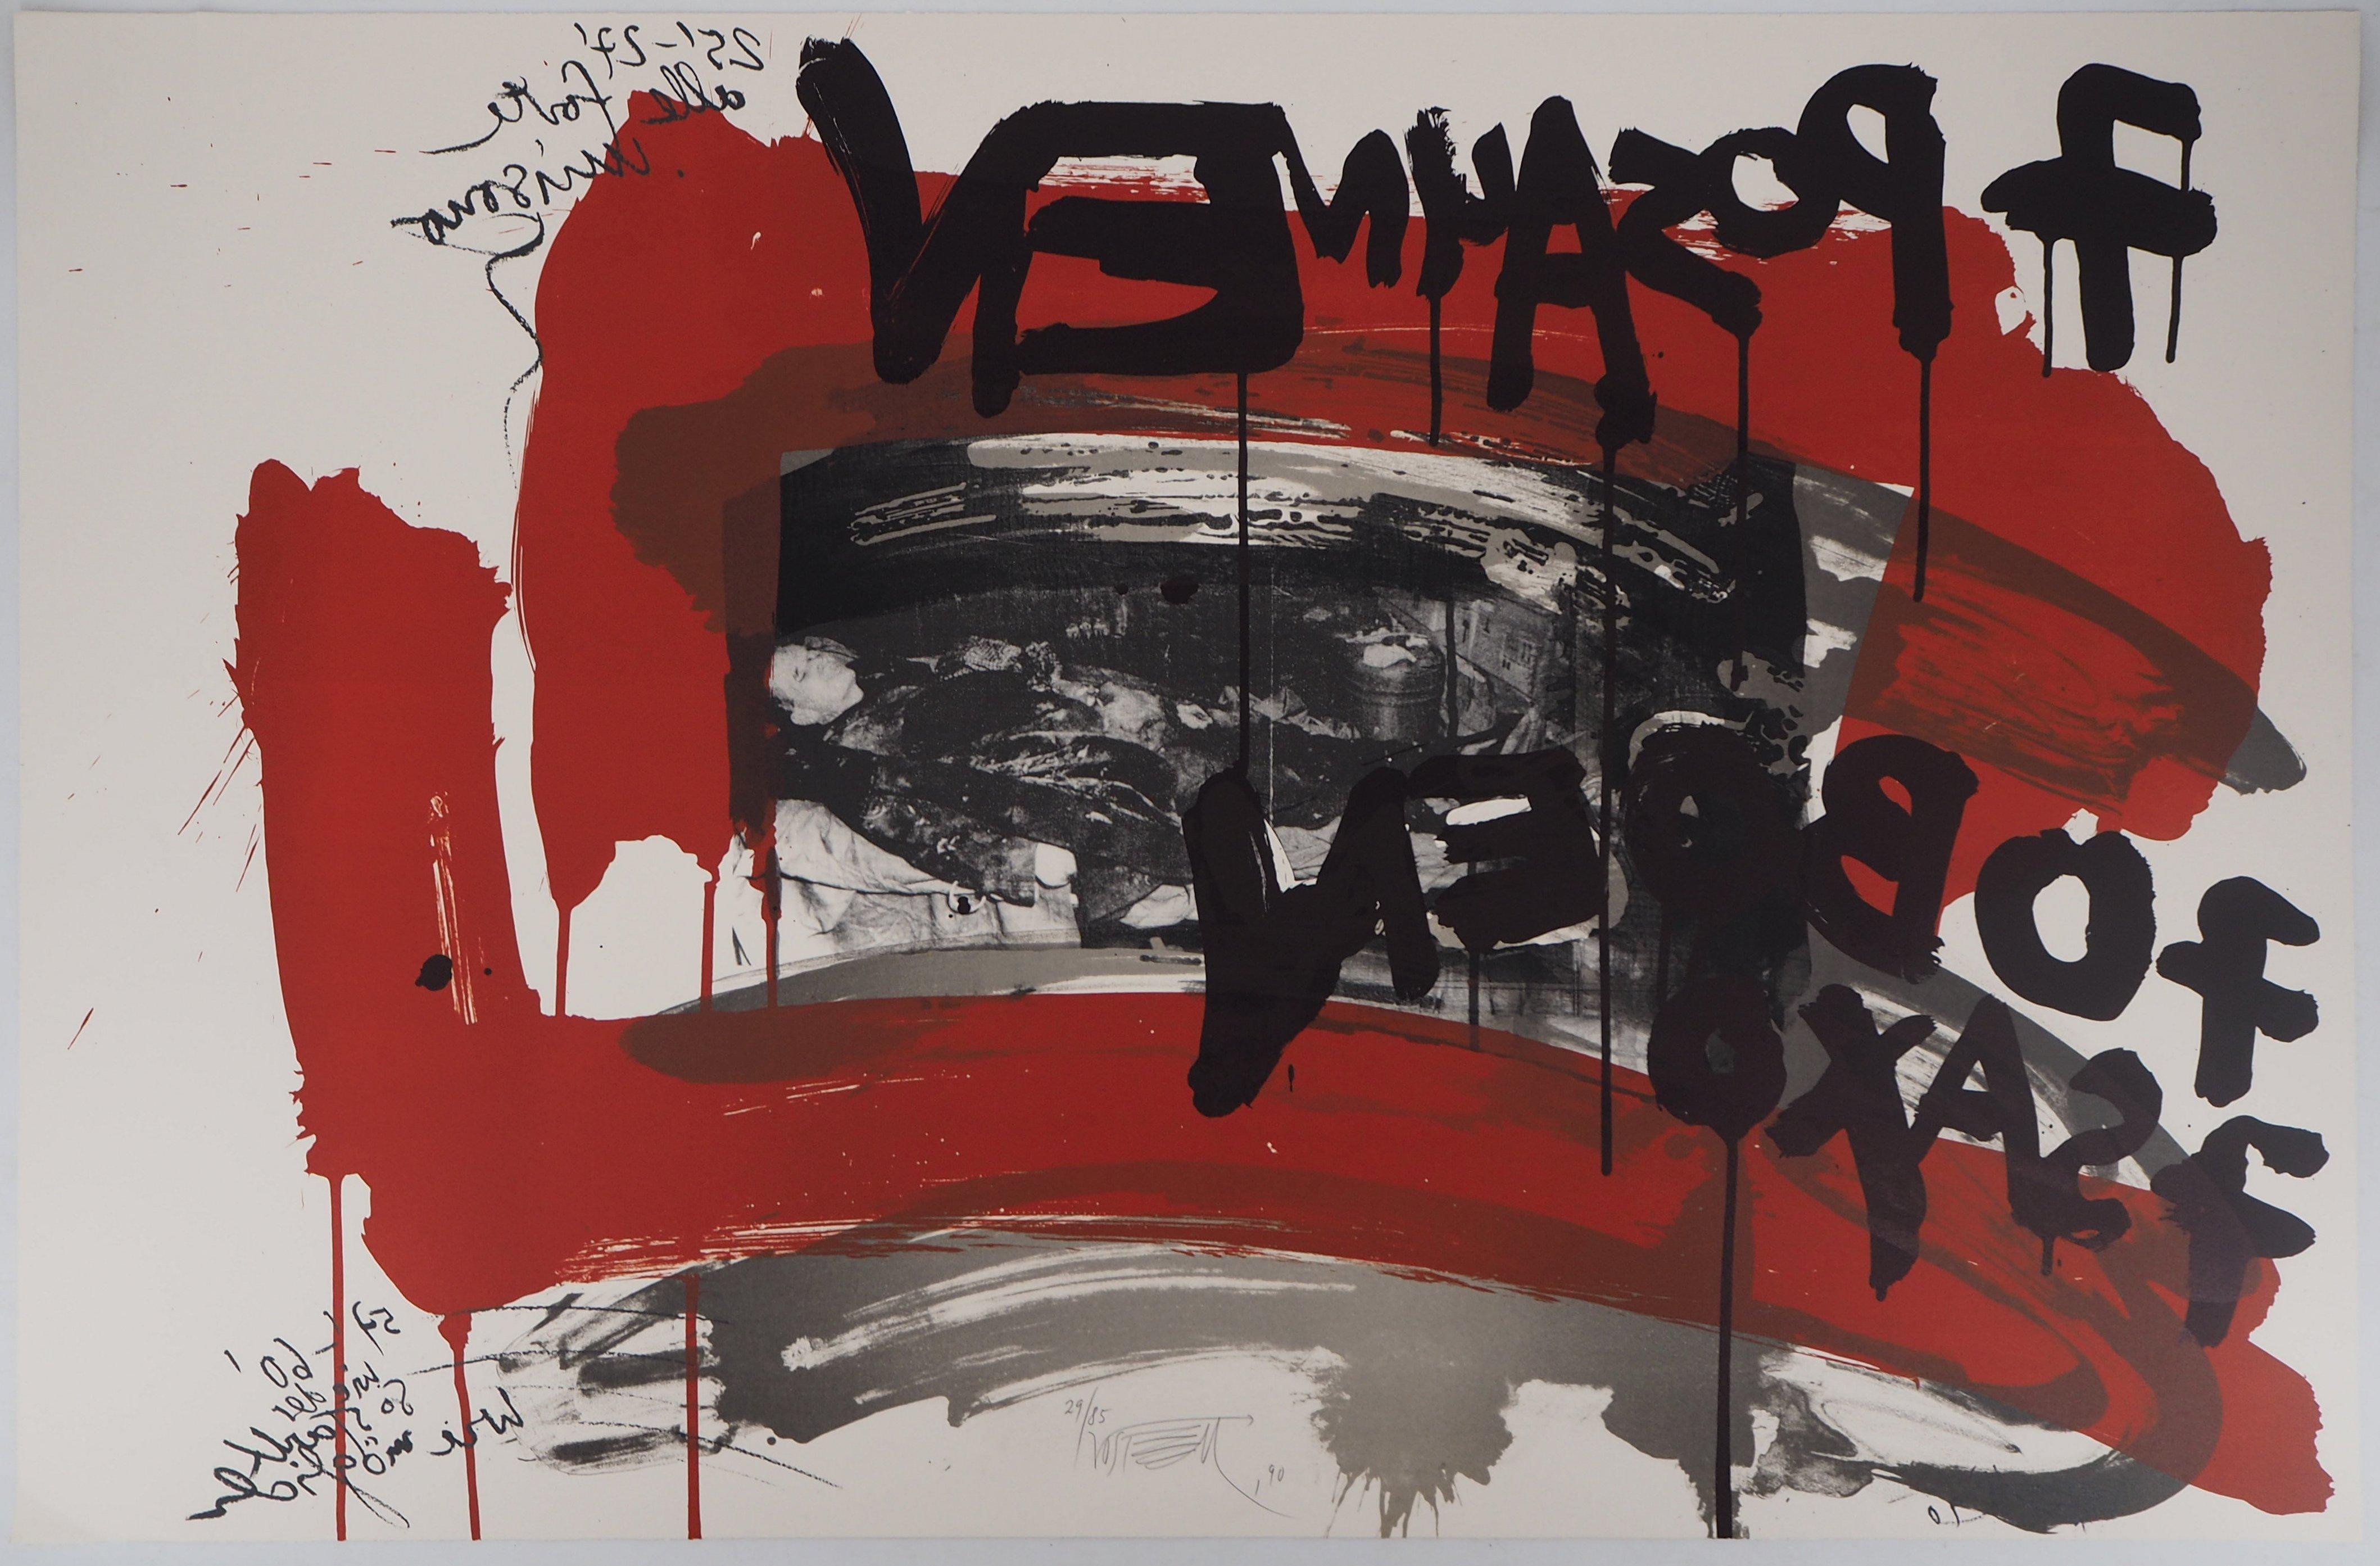 The Scream,  Man in black - Original handsigned lithograph - Ltd 85 cop (Fluxus)